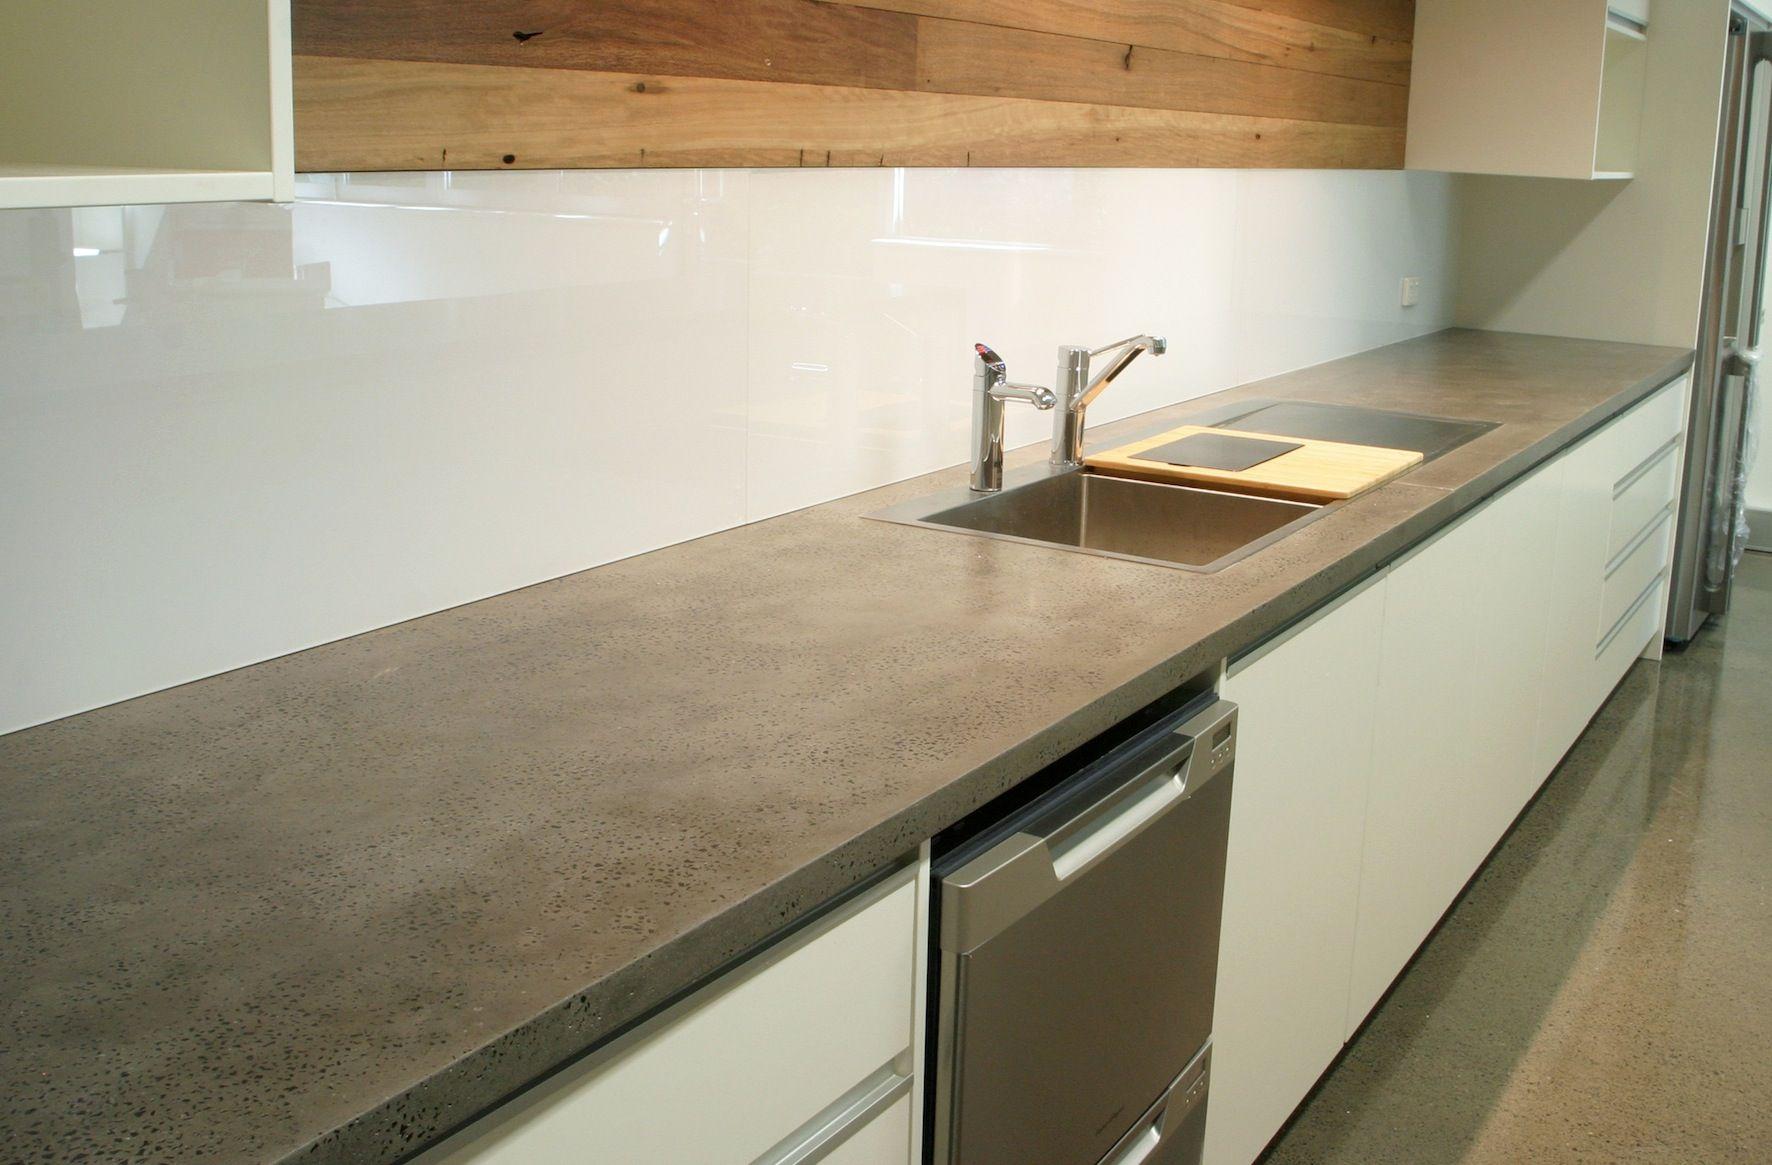 Granite Kitchen Benchtop Concrete Benchtops Are Fully Customisable Popconcrete Benchtops